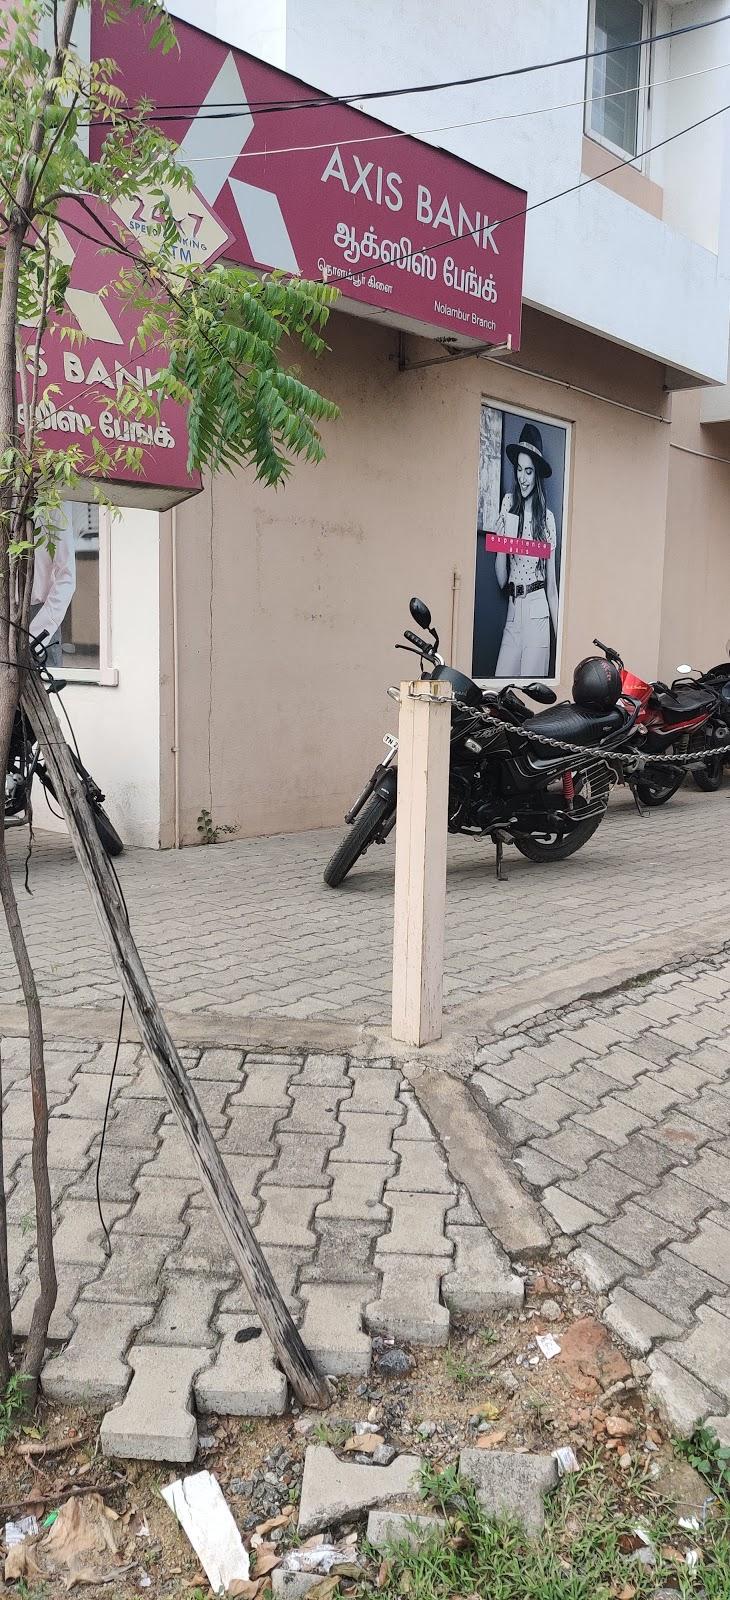 blood bank Axis Bank near West Mogappair Opposite Nolambur Police Station Tamil Nadu